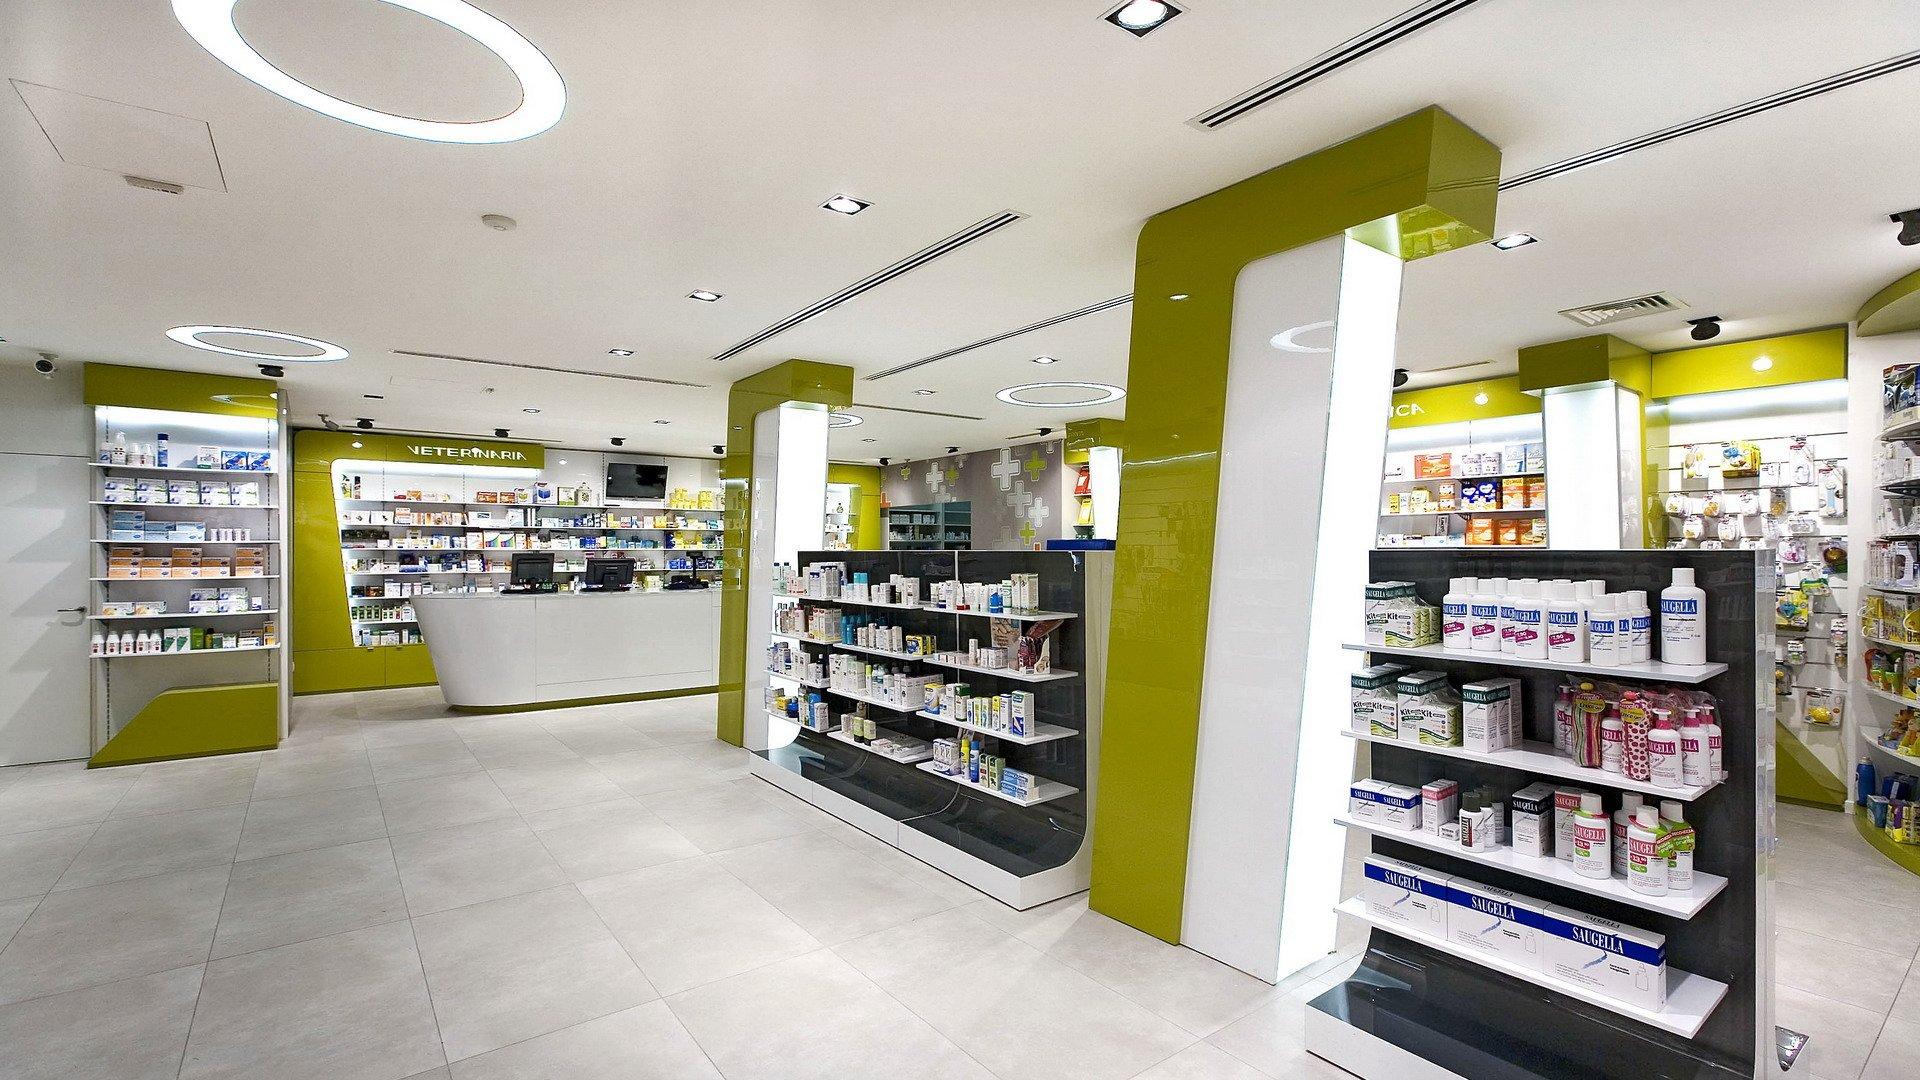 Arredamento farmacia img with arredamento farmacia for Bottigelli arredi farmacia